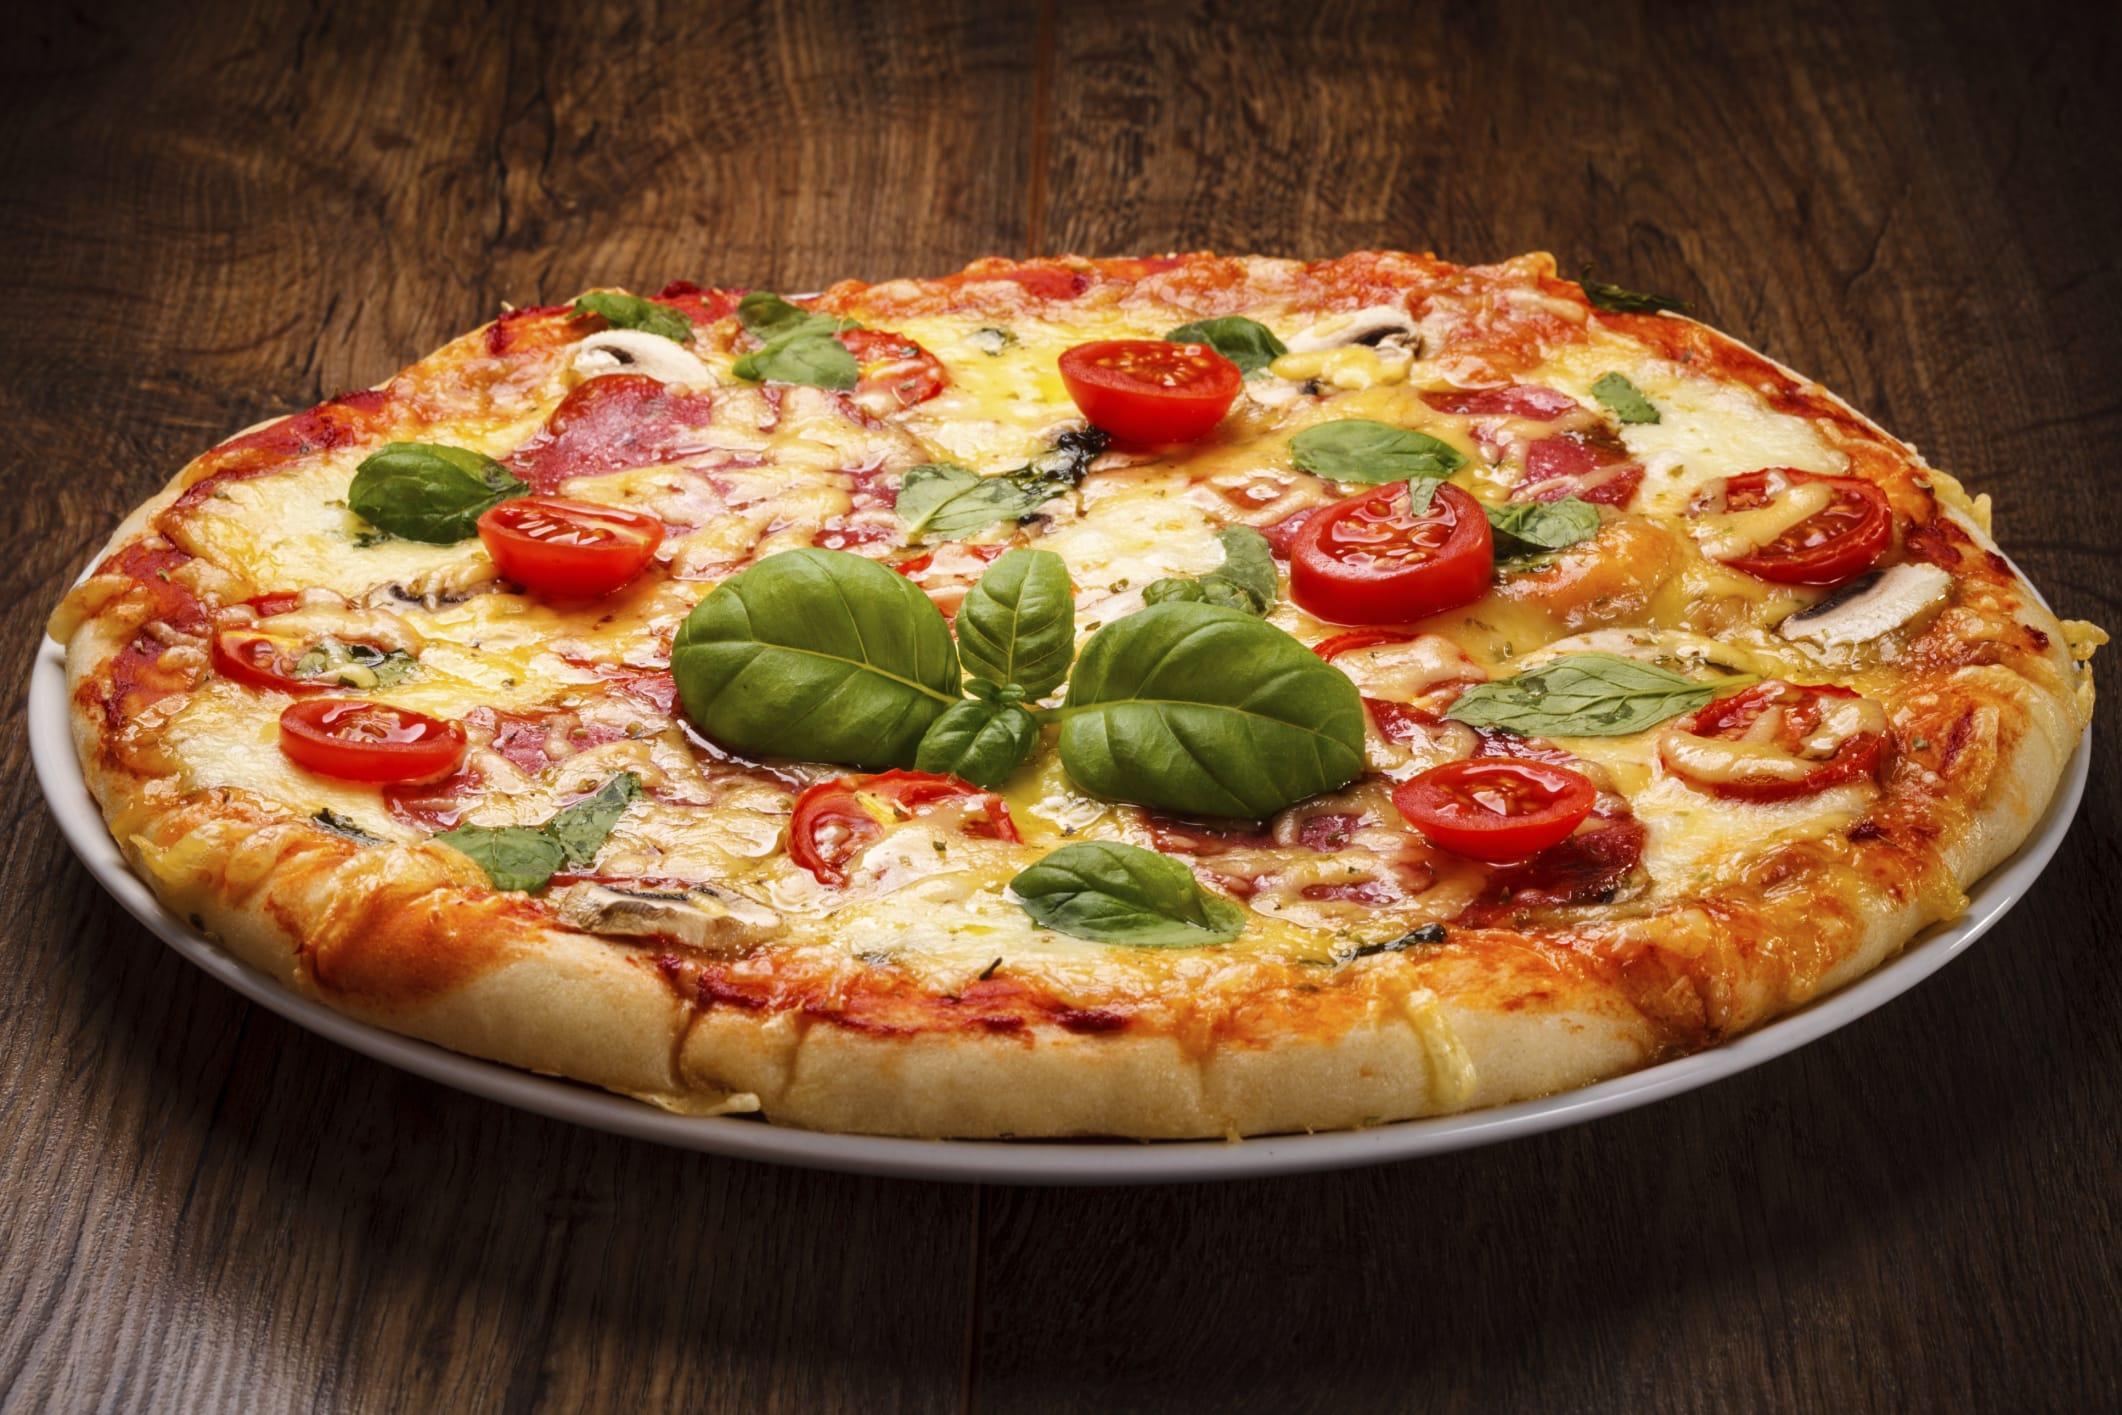 Pasta per pizza gia pronta ricette